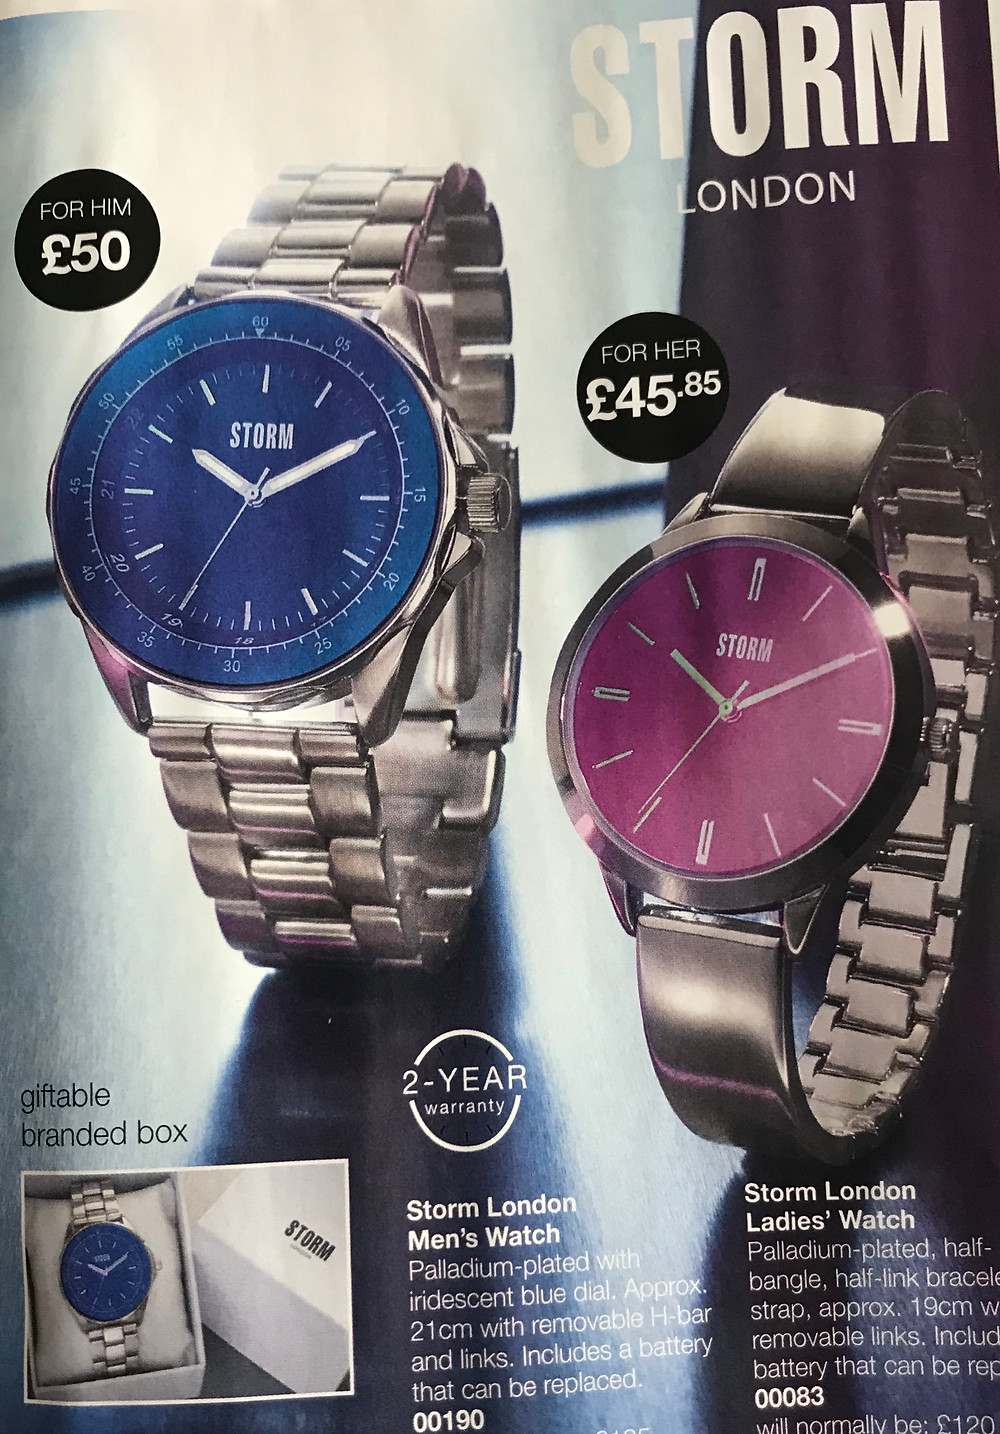 Join Avon, Become an Avon Rep, Be an Avon Rep, applyreps.co.uk